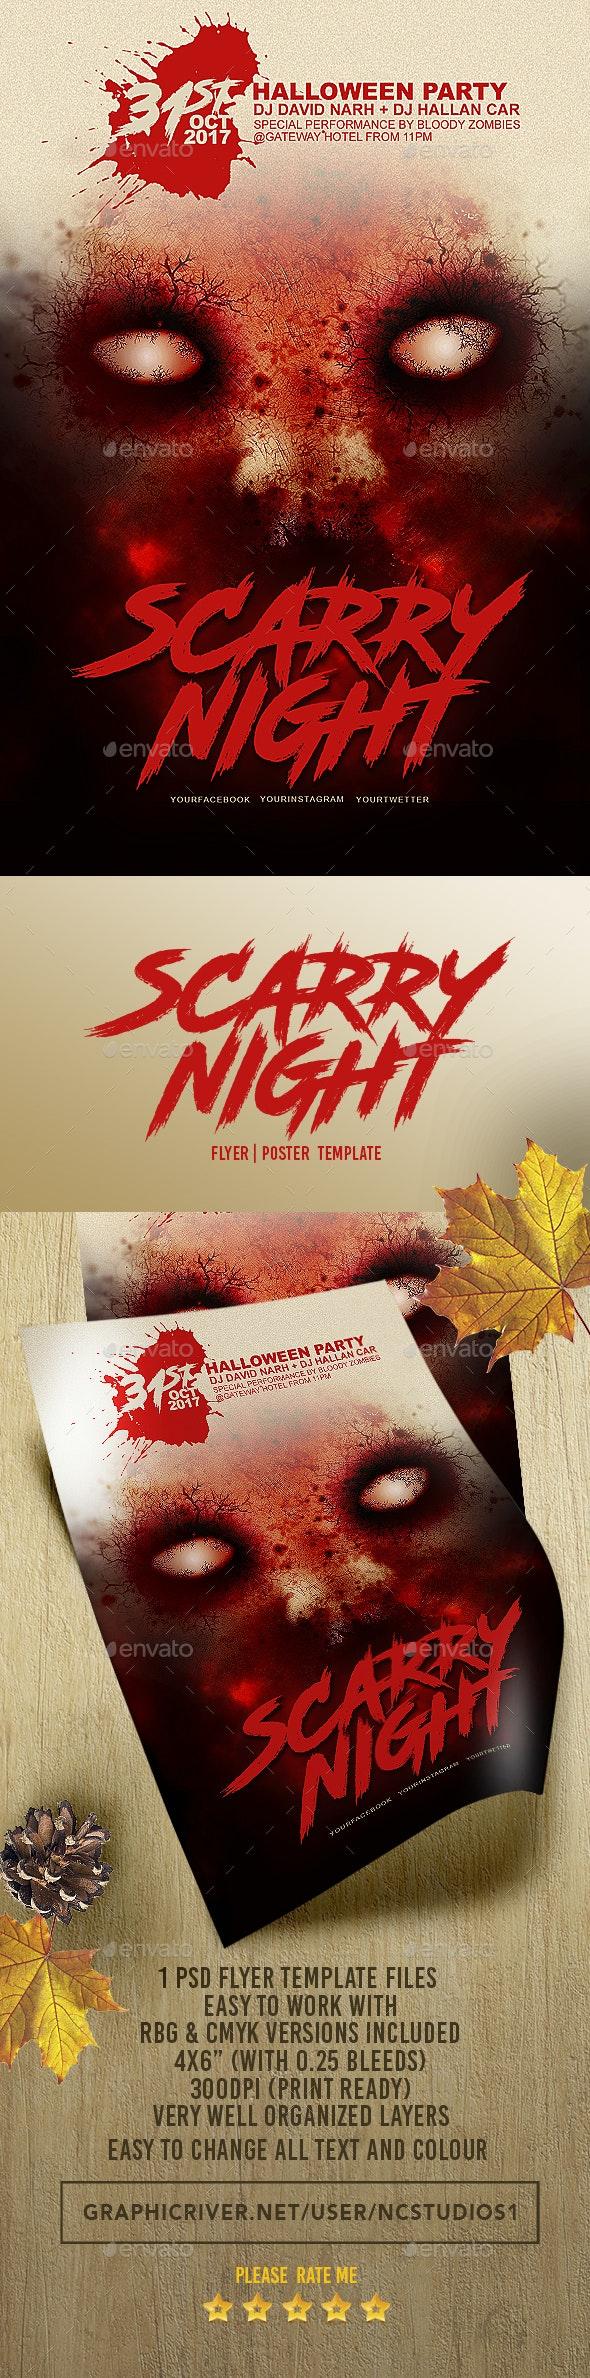 Halloween Flyer Template 3 - Flyers Print Templates